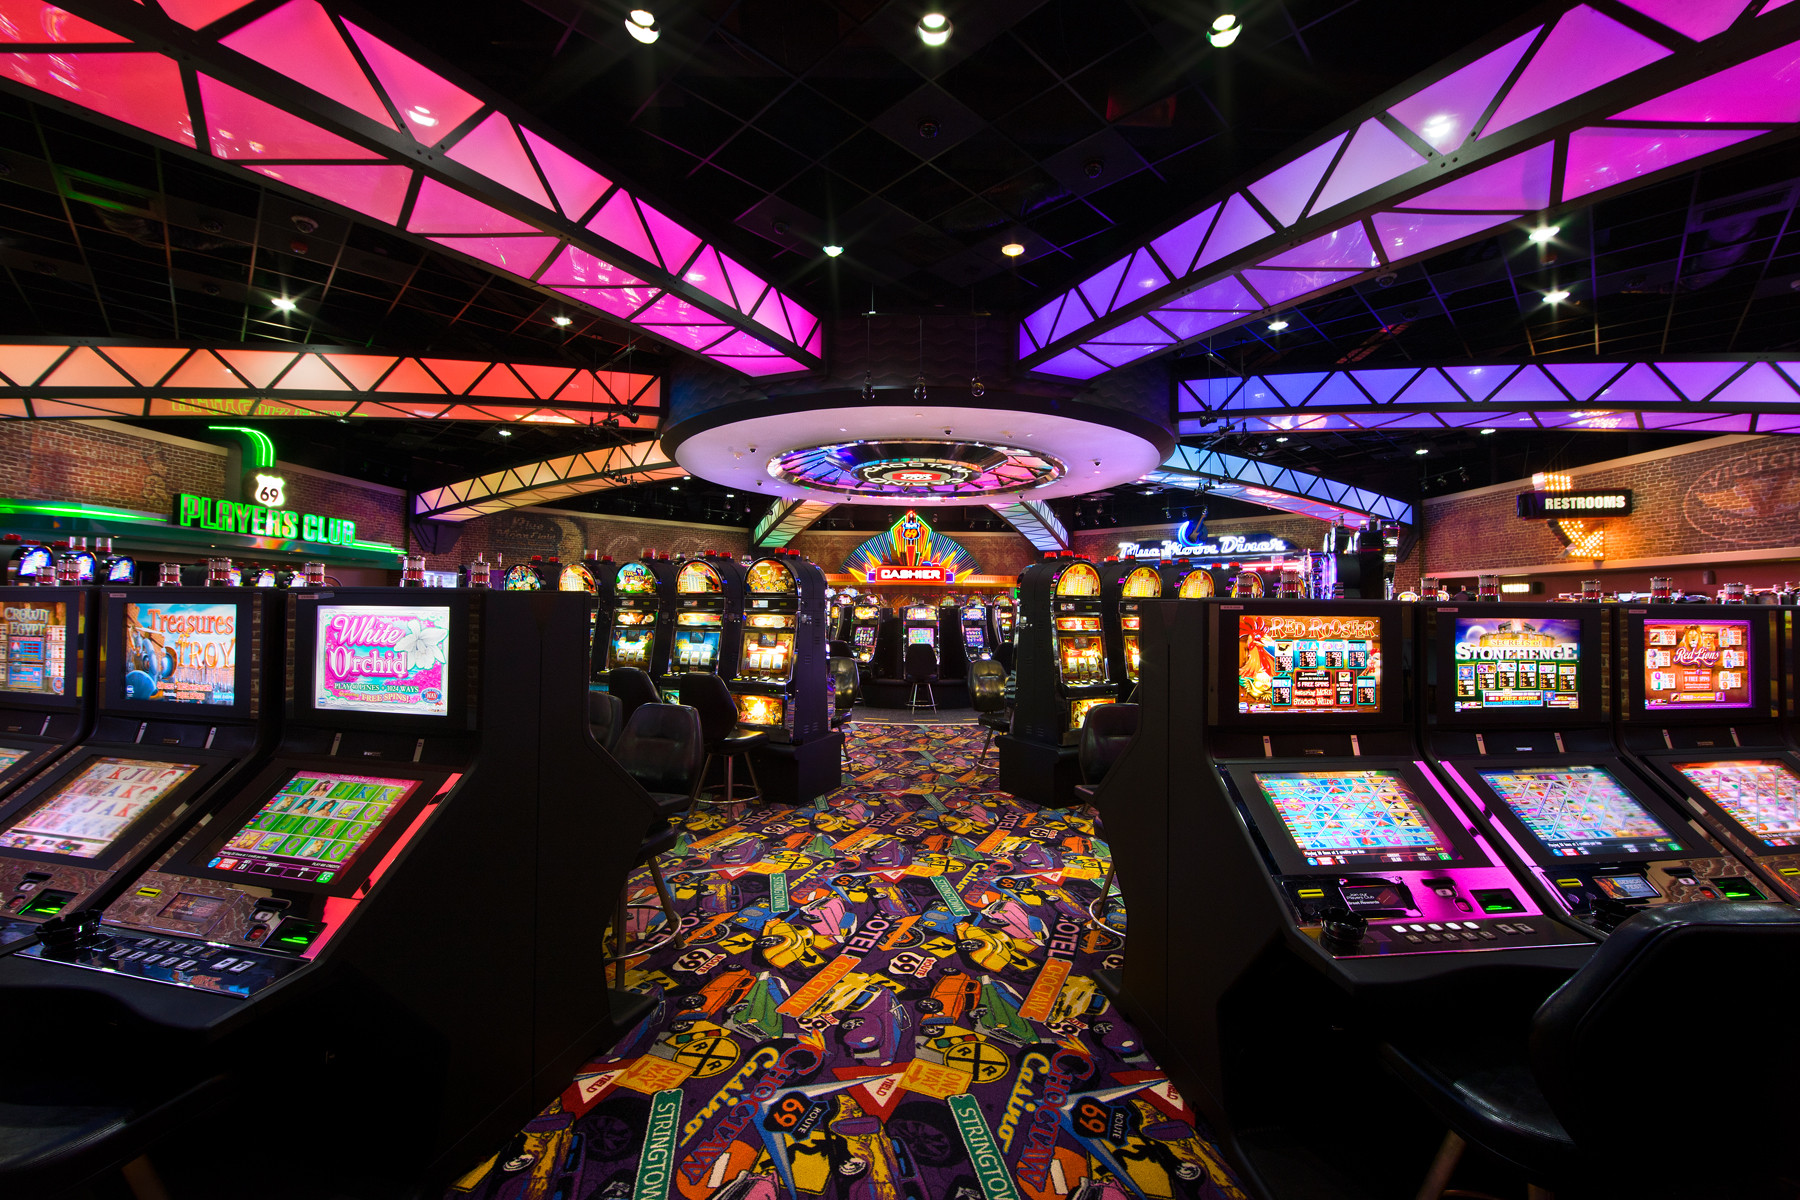 Route-69-Casino-Interior-casino-design-1800x1200